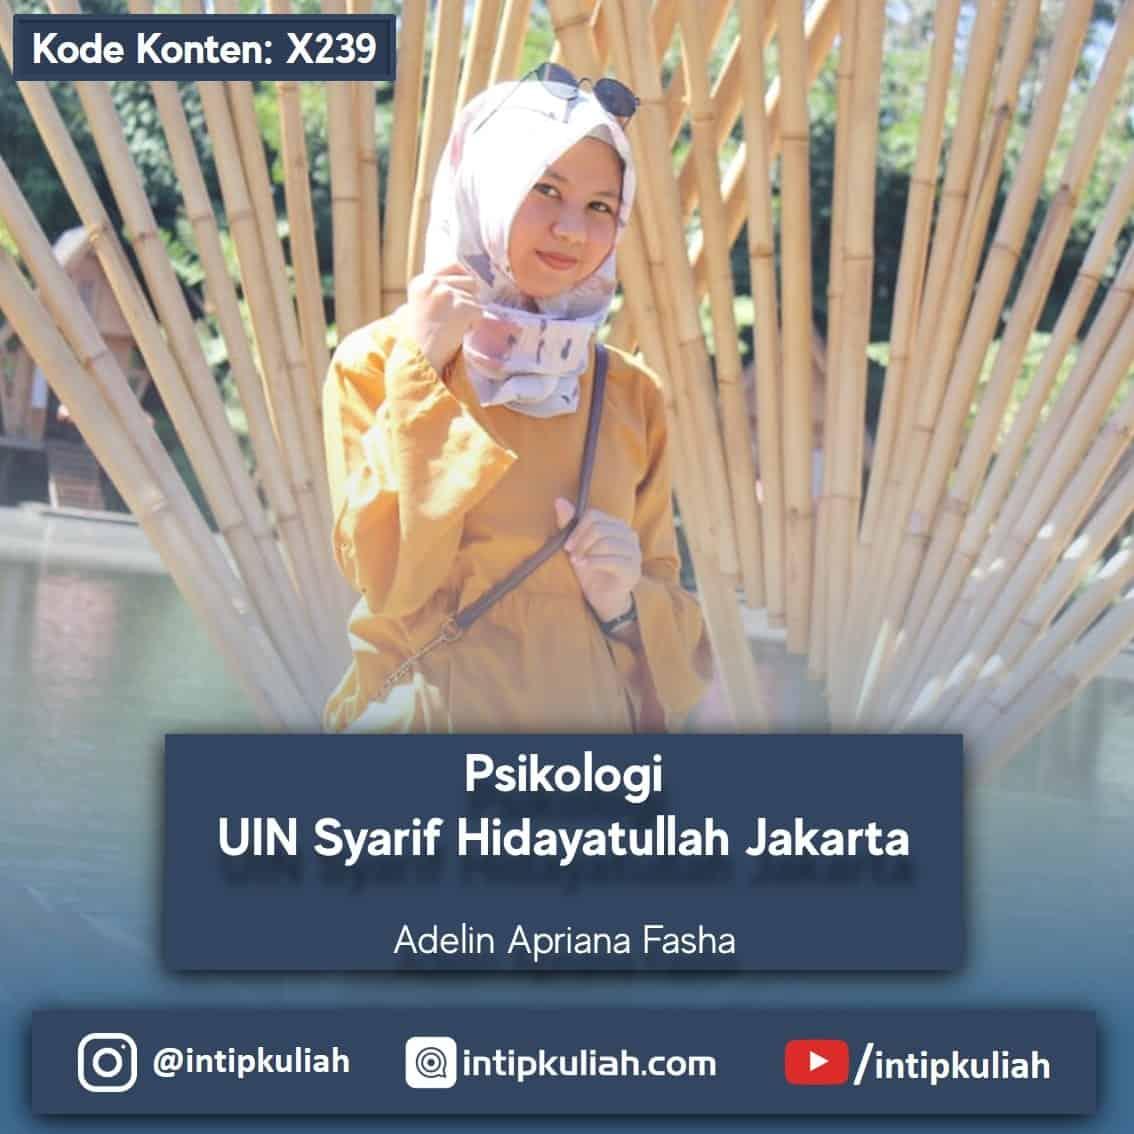 Psikologi UIN Syarif Hidayatullah Jakarta (Adelin)